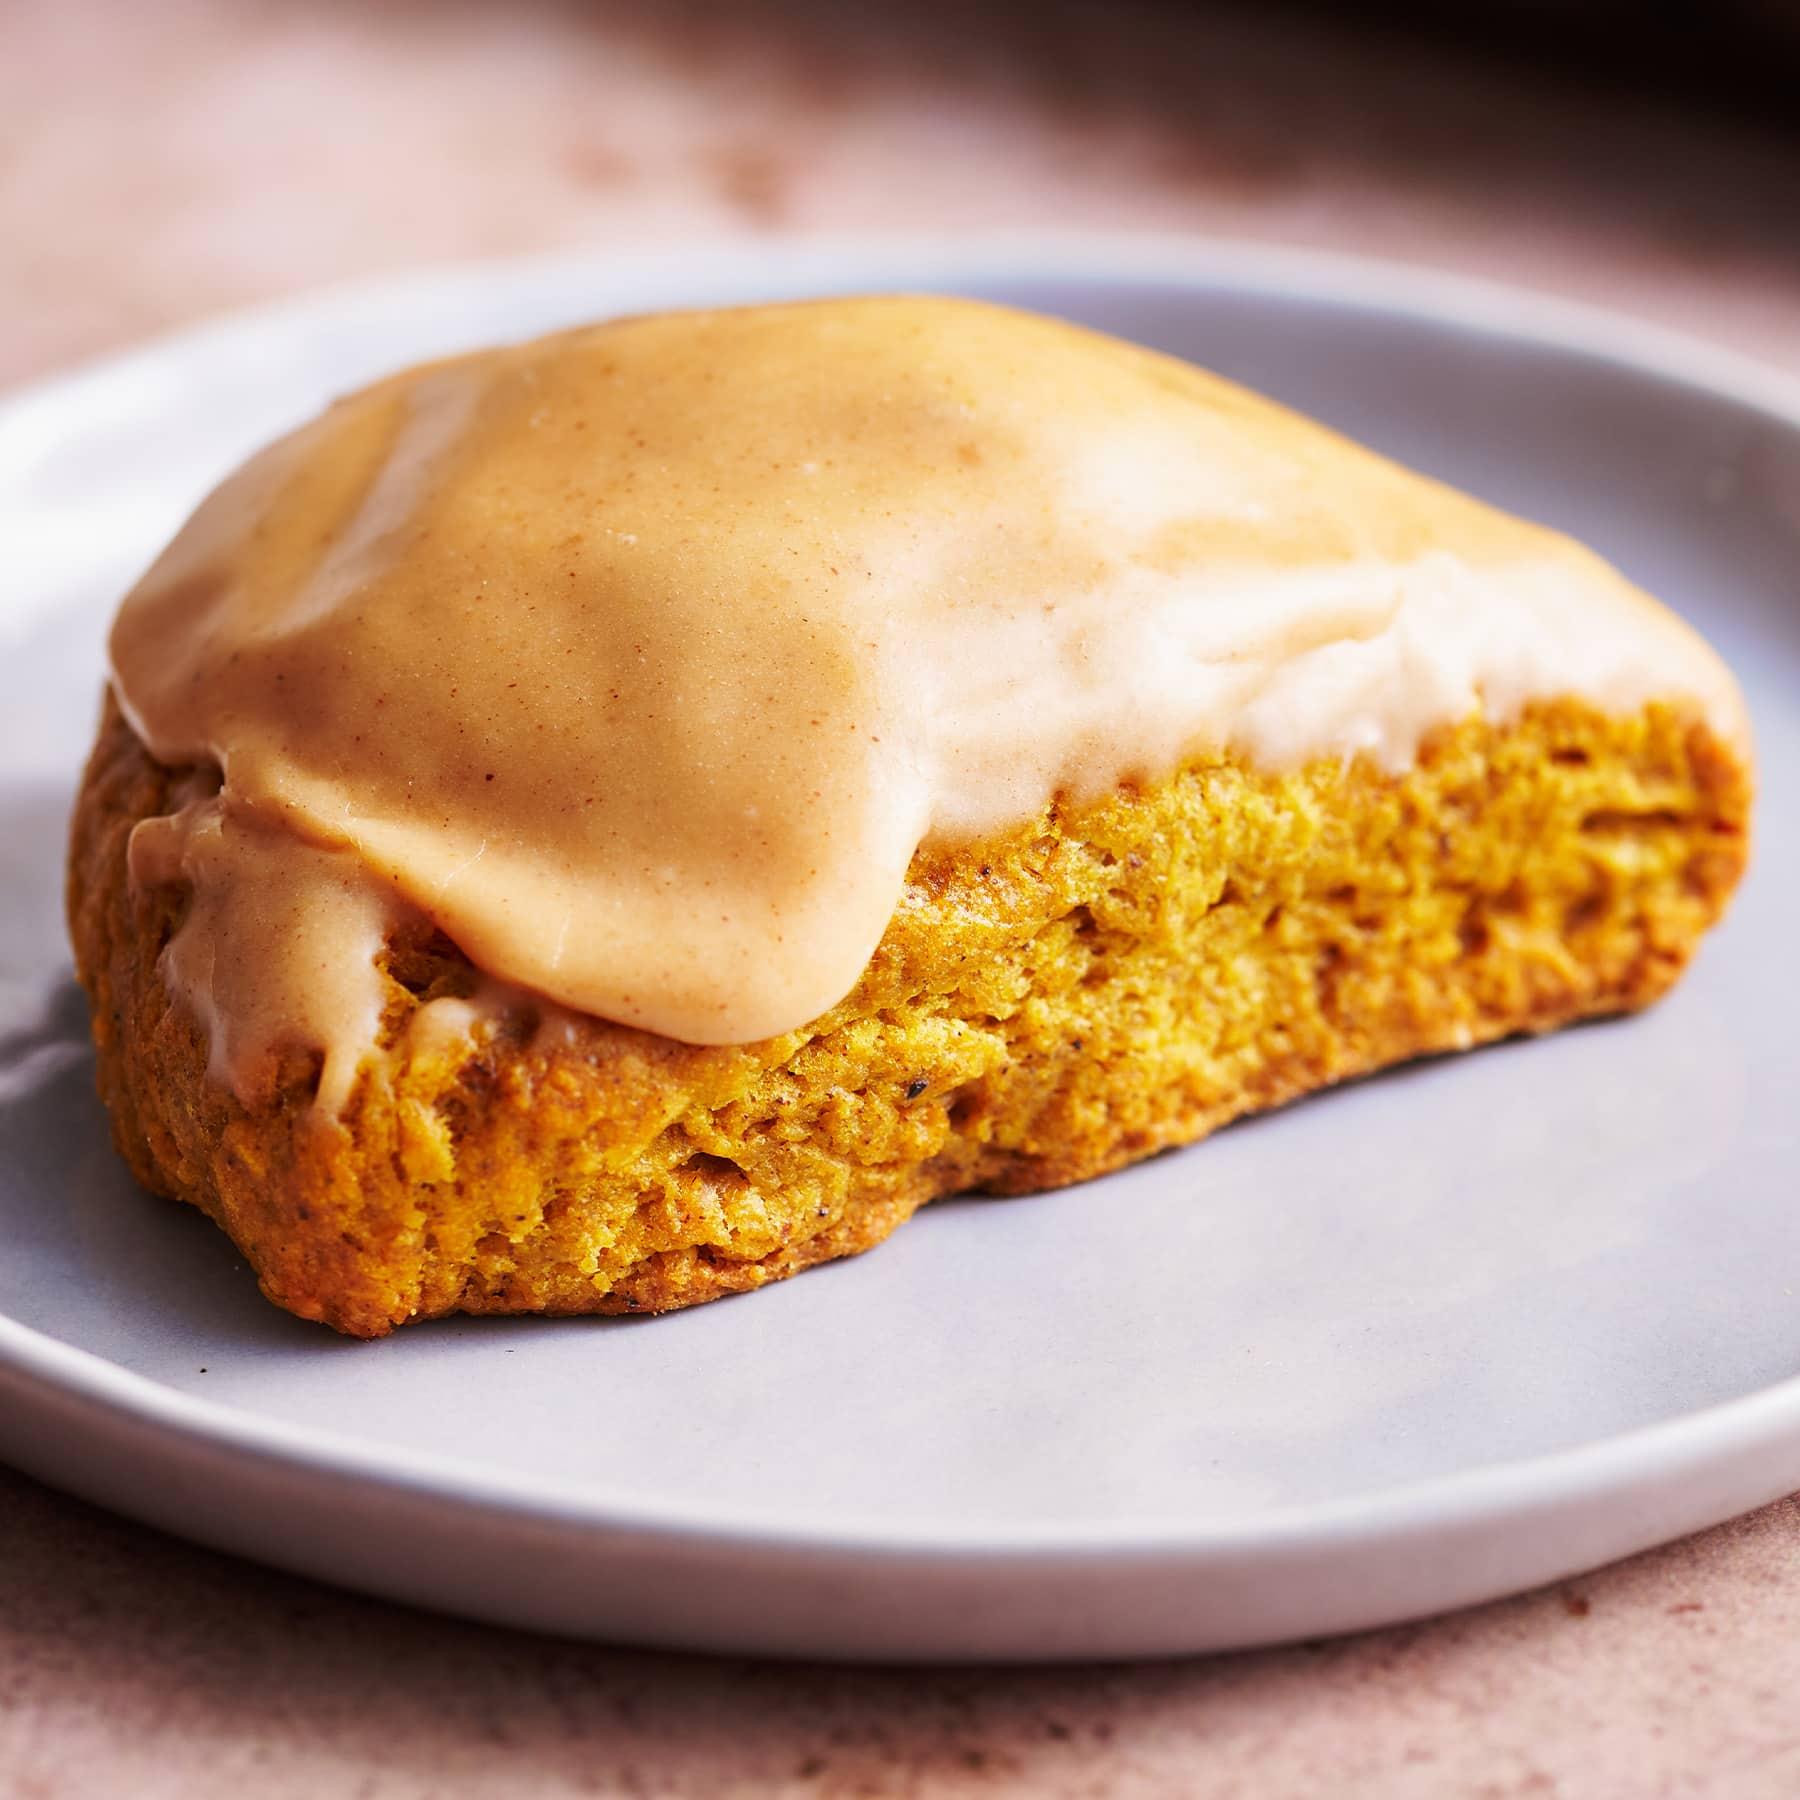 homemade pumpkin scone with pumpkin glaze